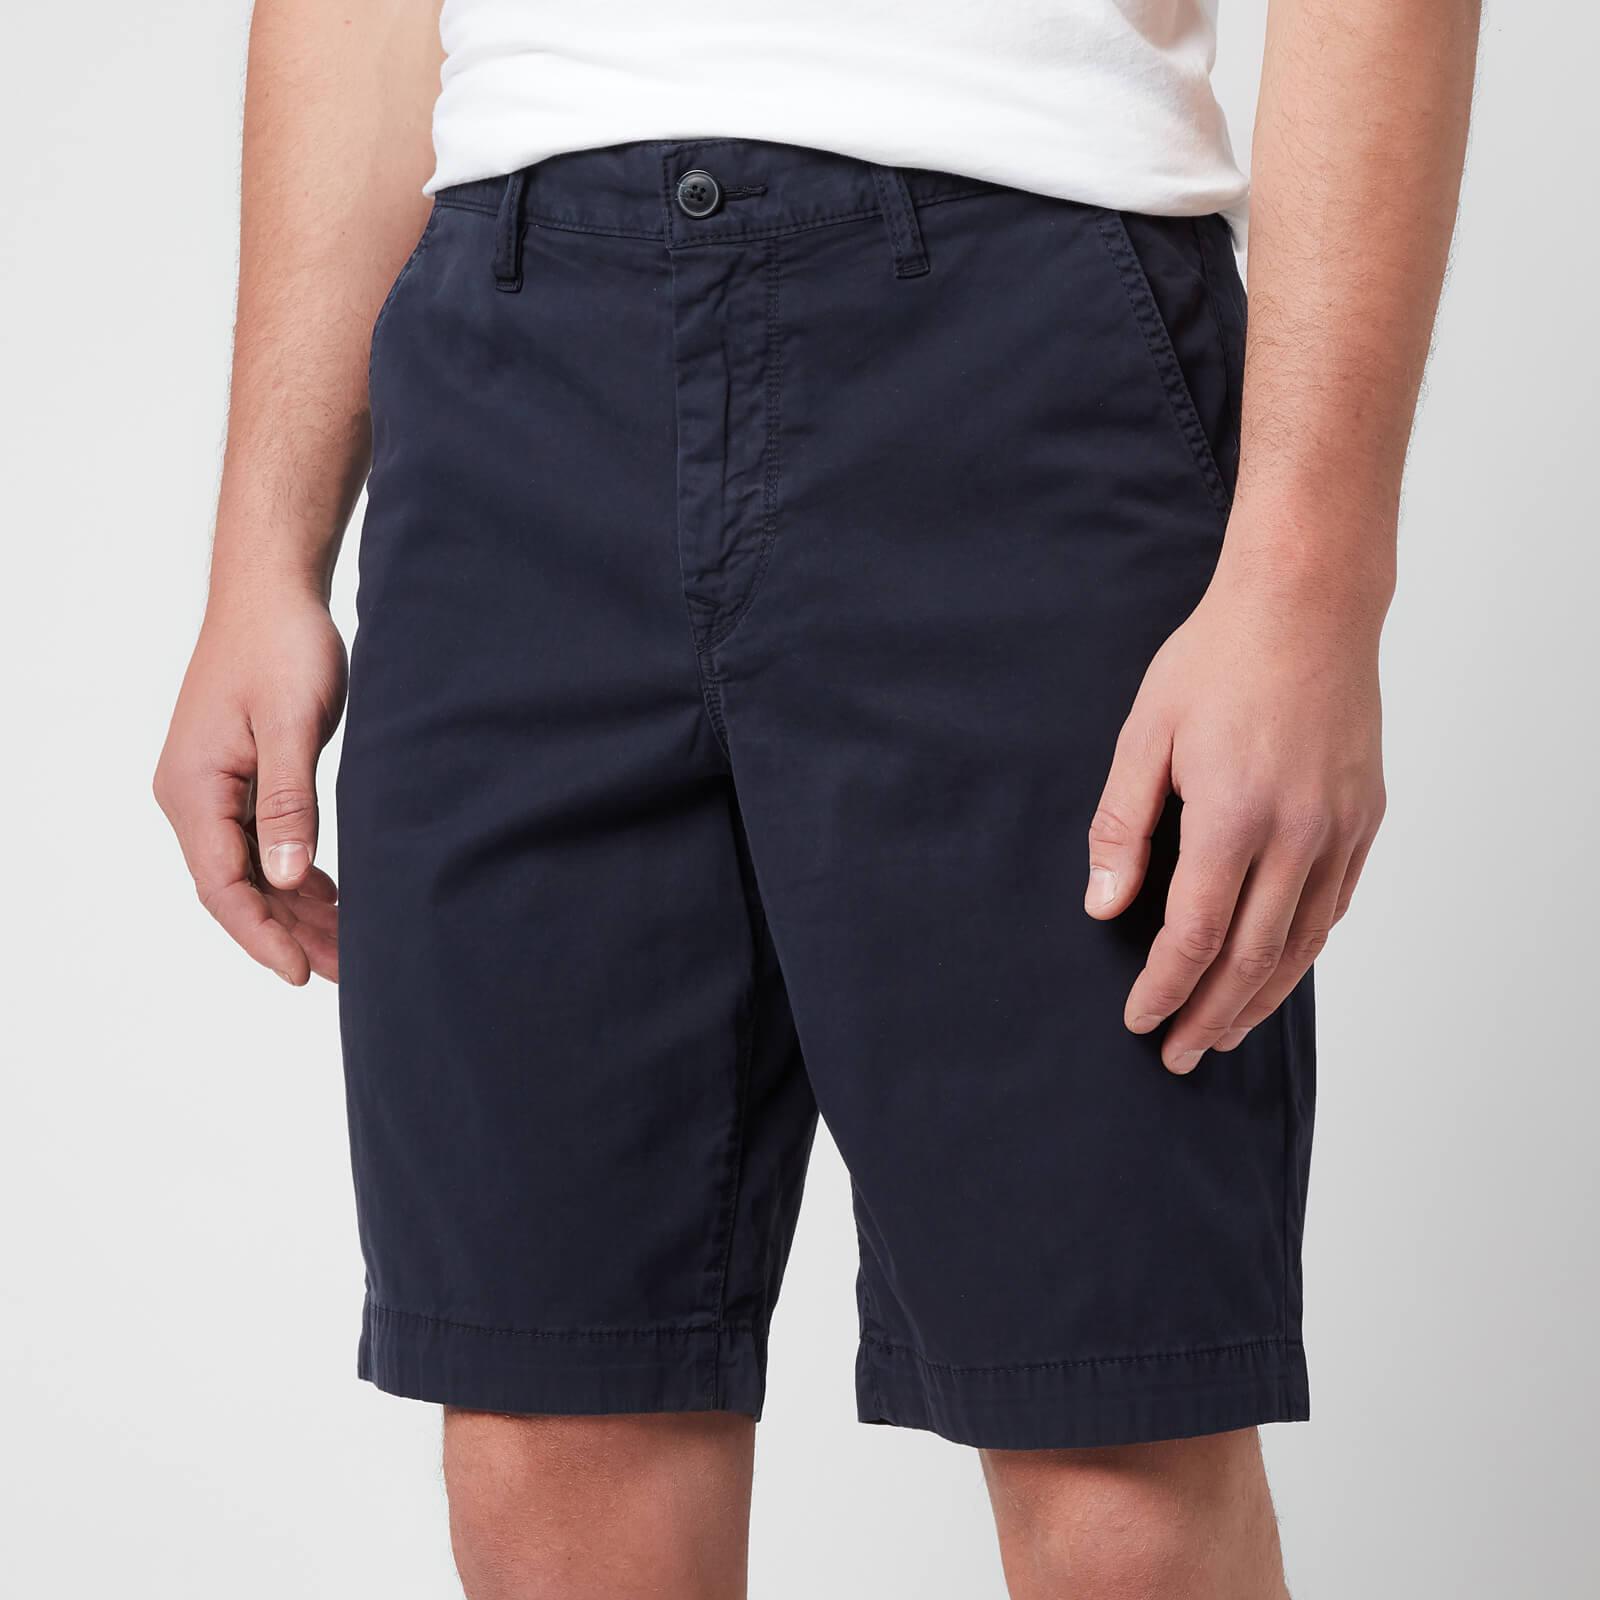 BOSS Casual Men's Schino Taber Shorts - Dark Blue - W30